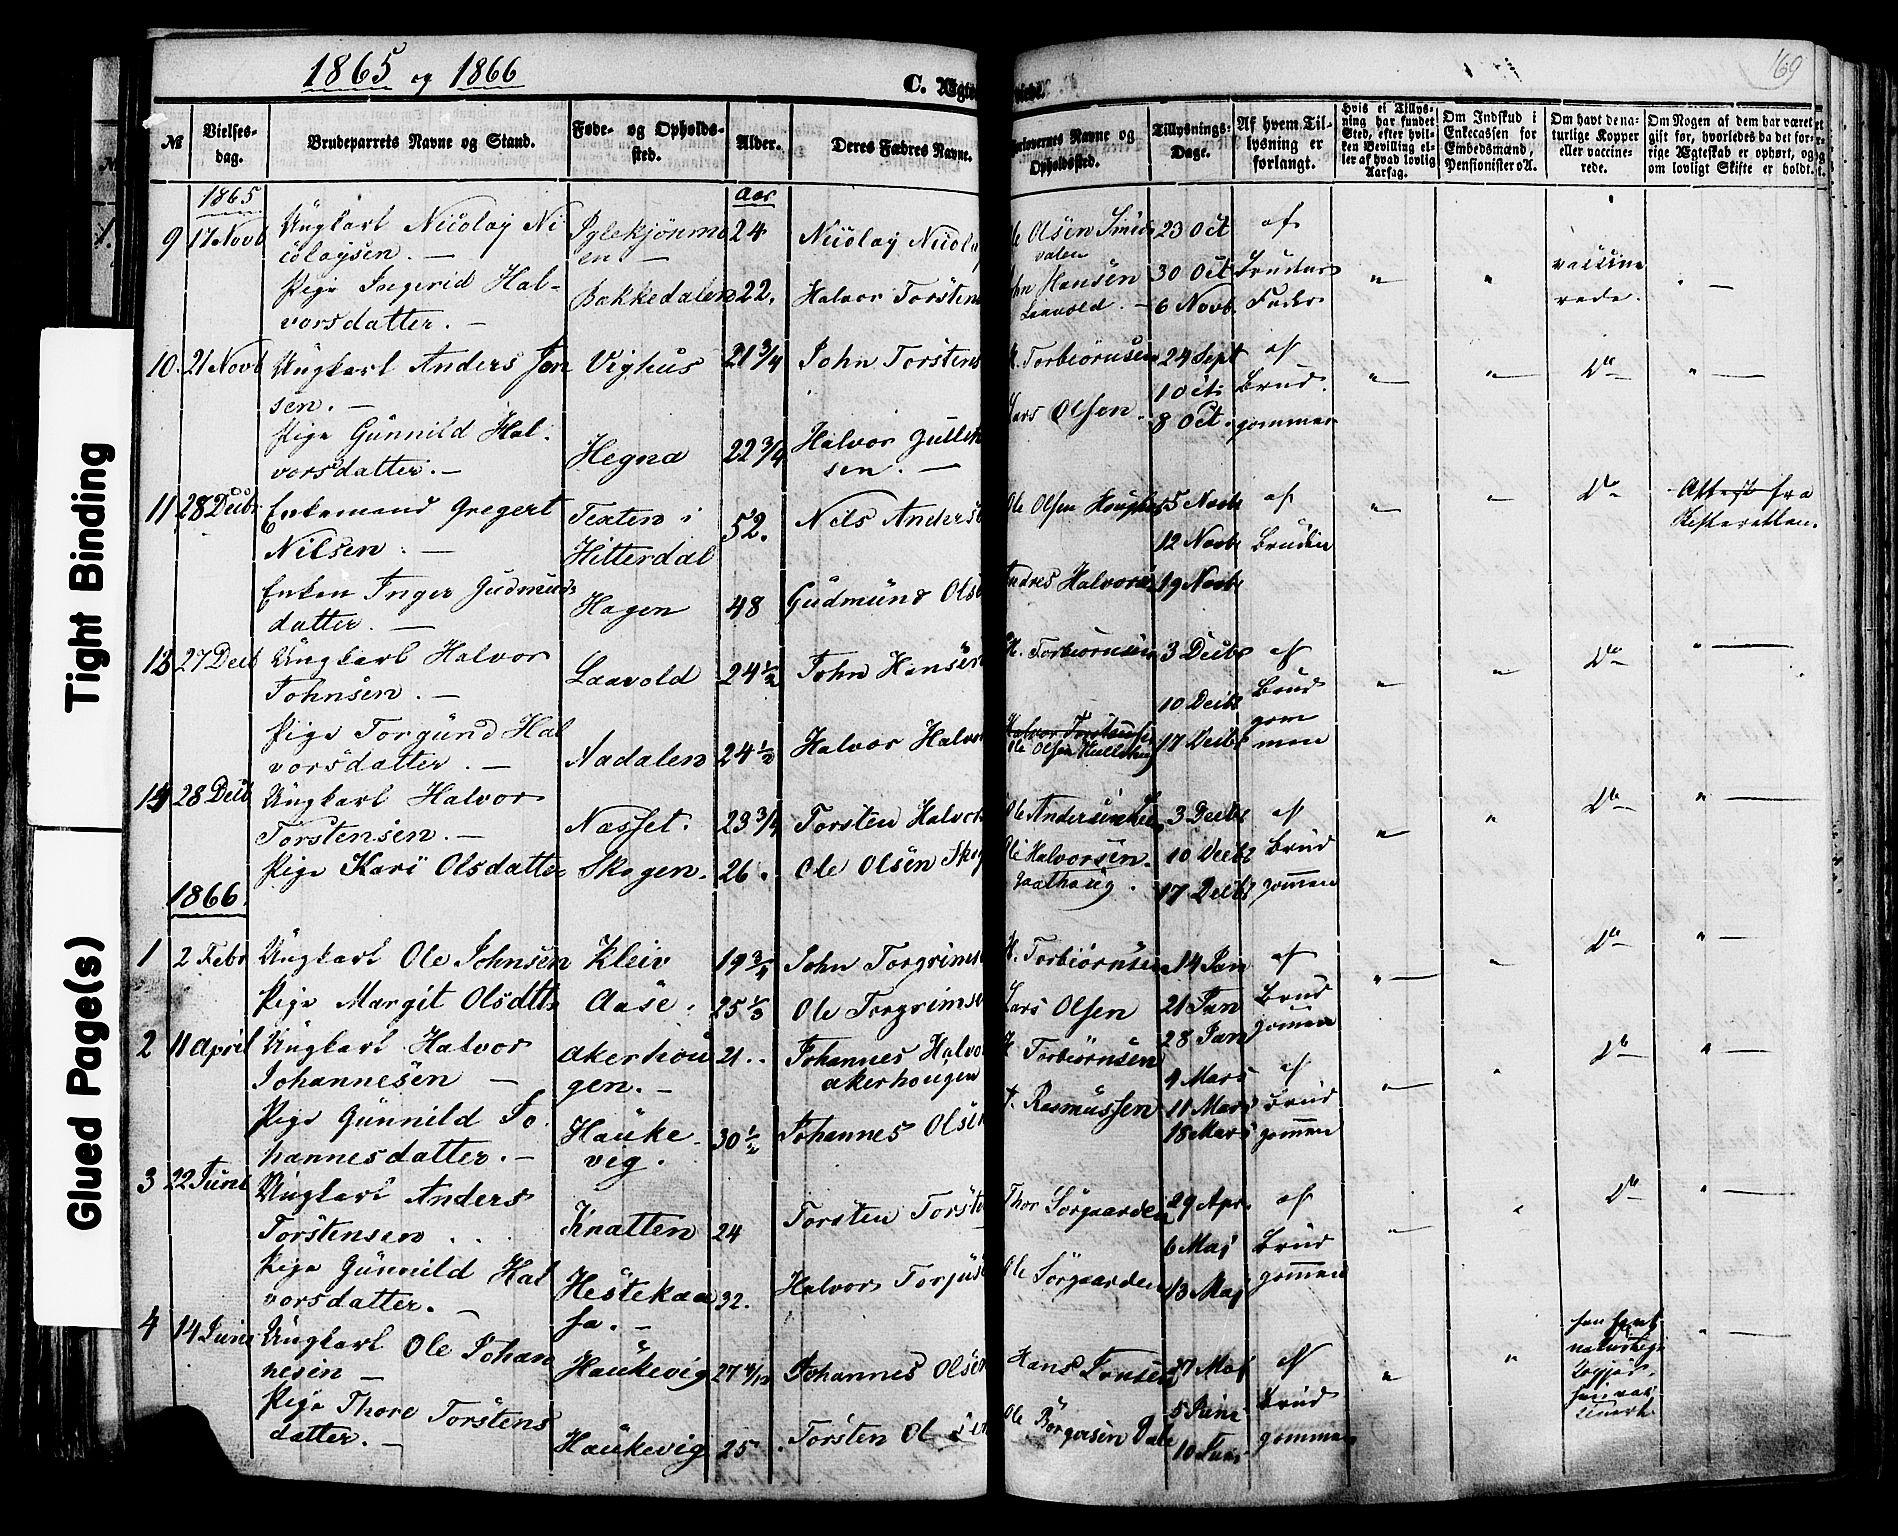 SAKO, Sauherad kirkebøker, F/Fa/L0007: Ministerialbok nr. I 7, 1851-1873, s. 169